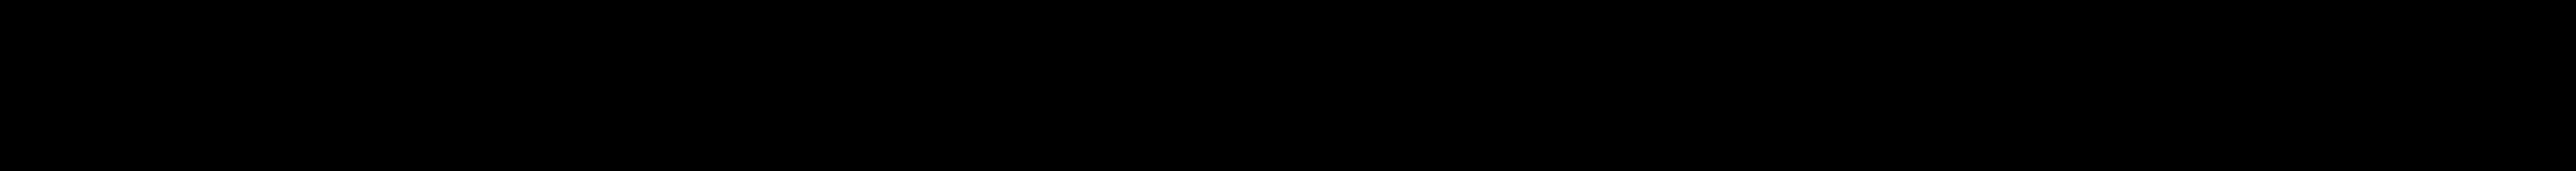 Kleptocracy Condensed Regular